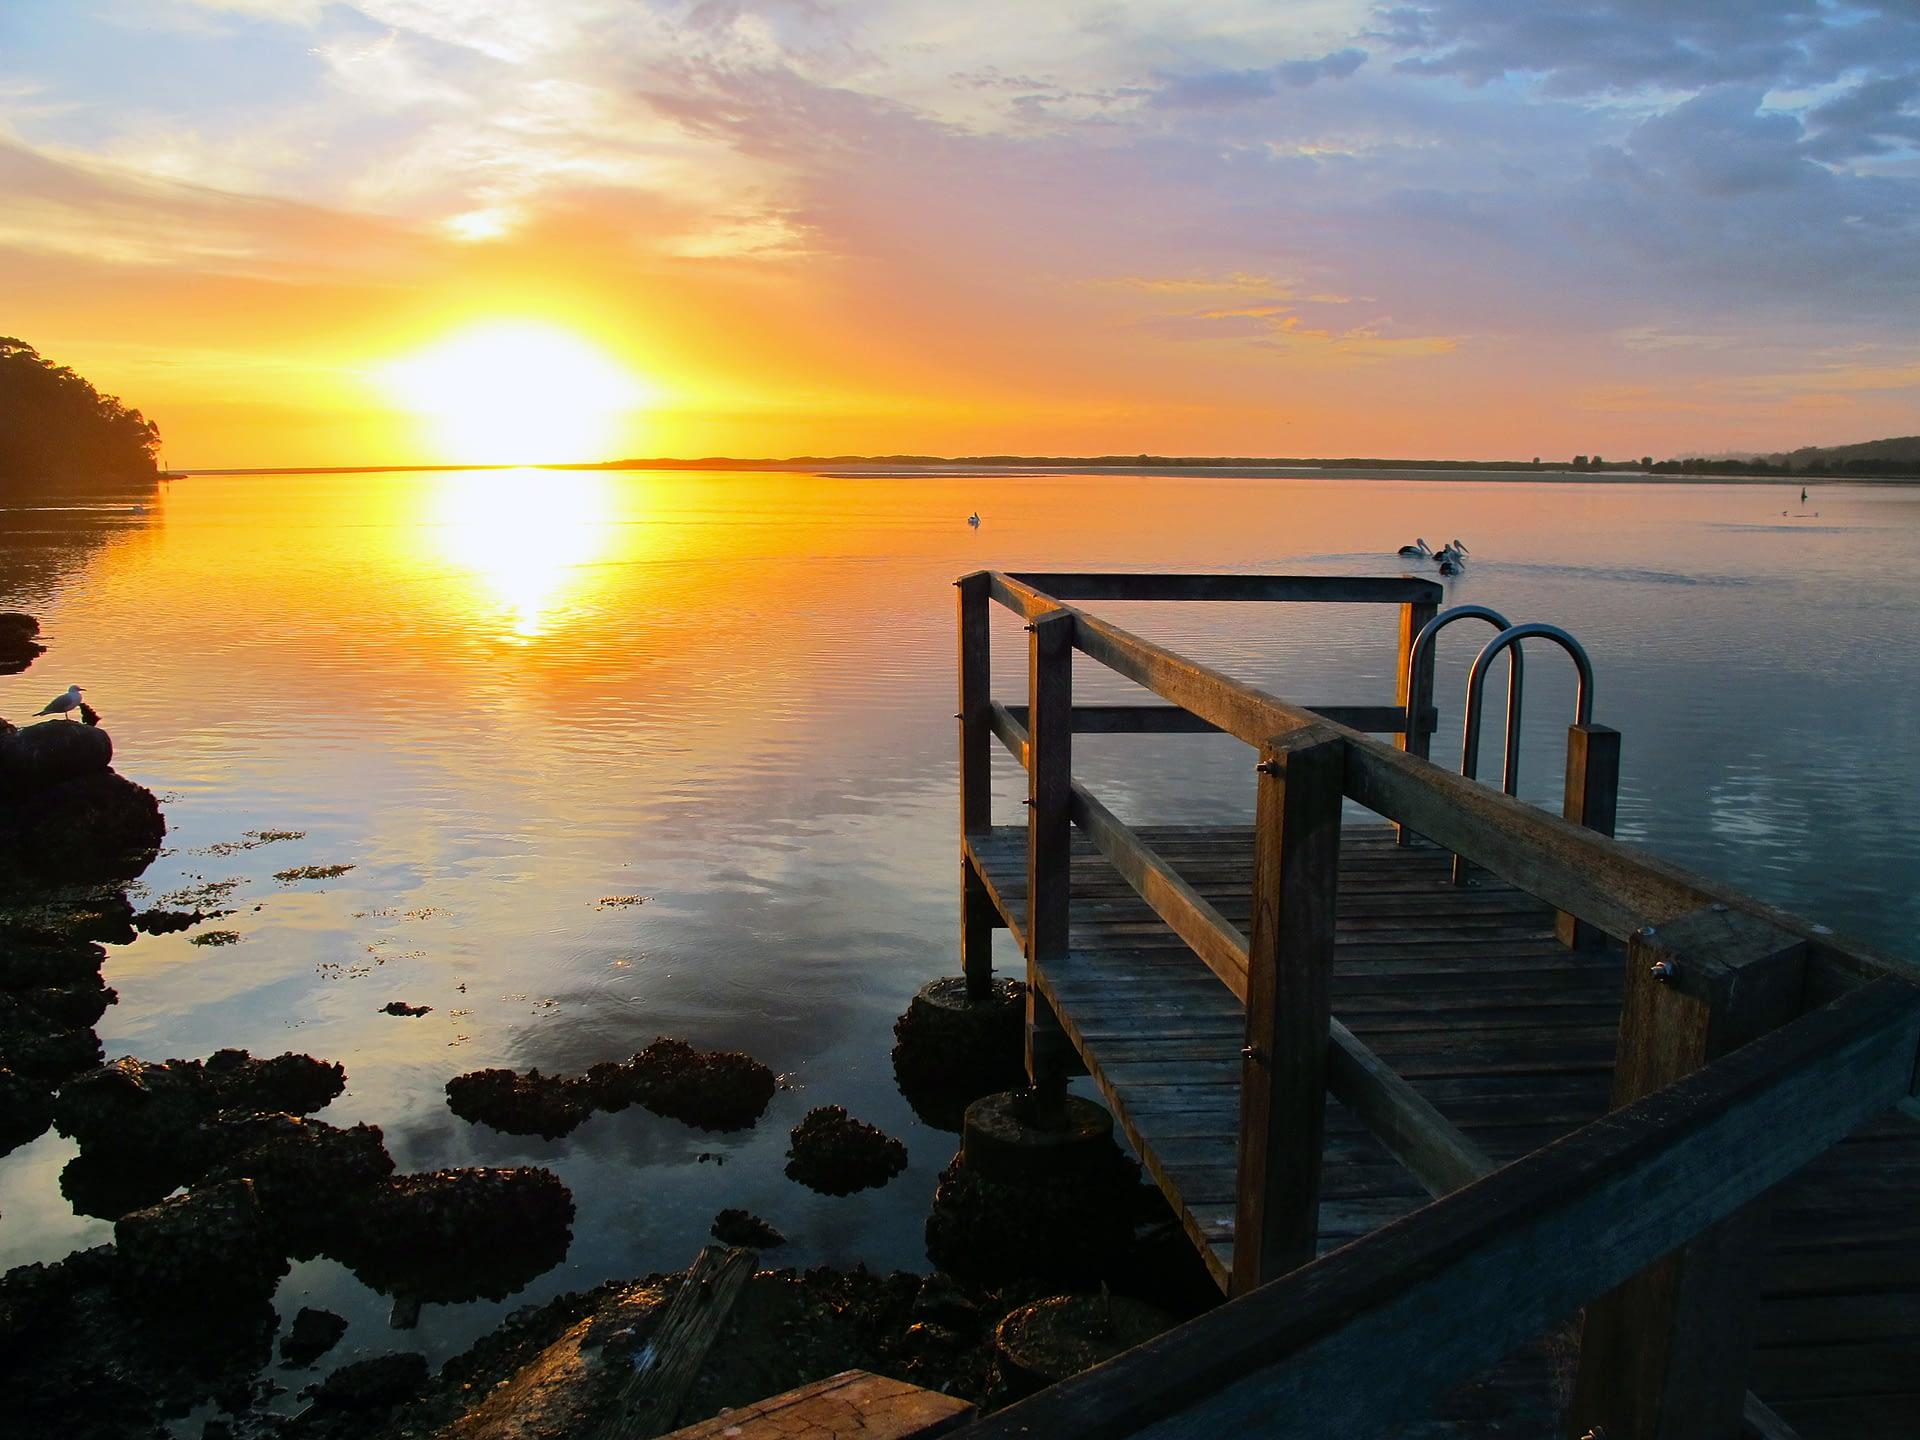 Sunrise from the boat ramp, Tuross Head, NSW.